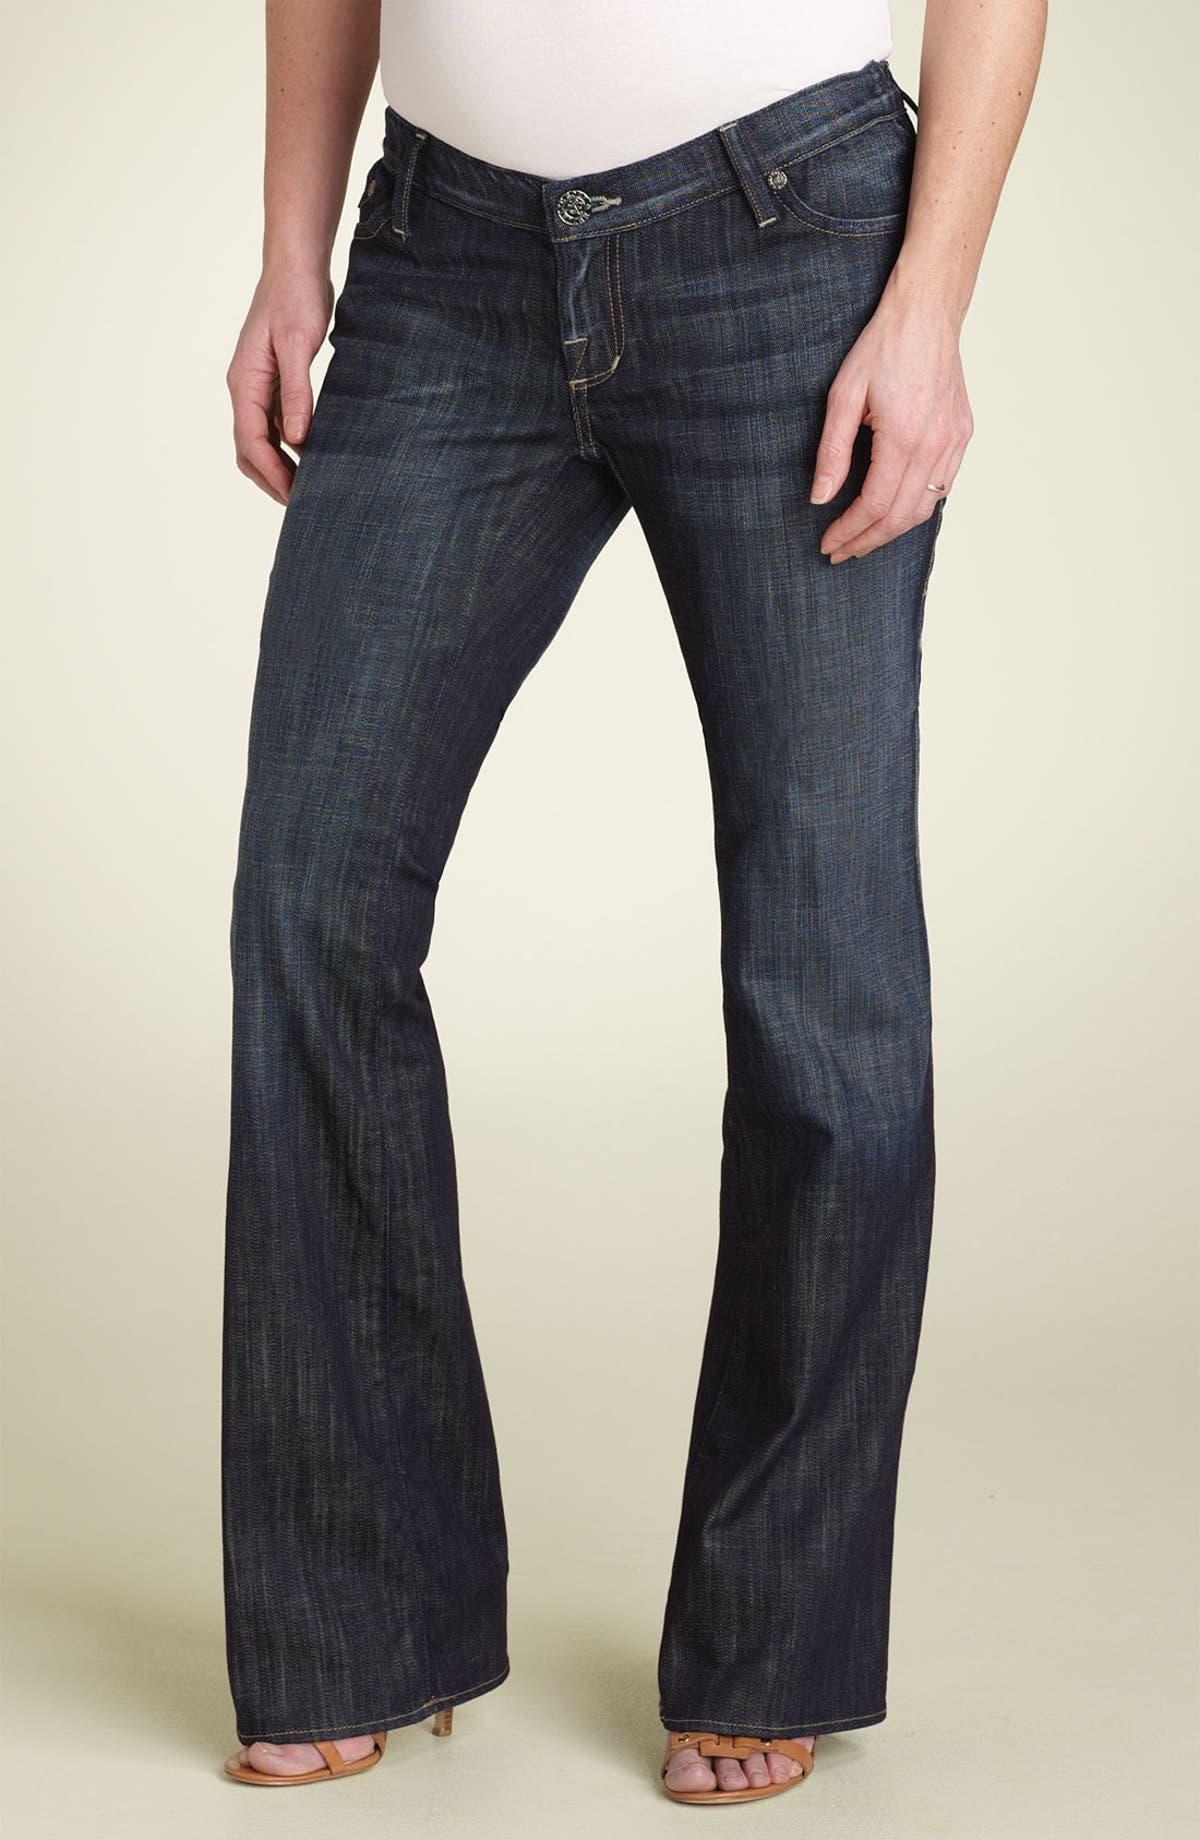 aa2865652e9cb Rock & Republic 'Tyler' Maternity Stretch Jeans (Amethyst Blue) | Nordstrom